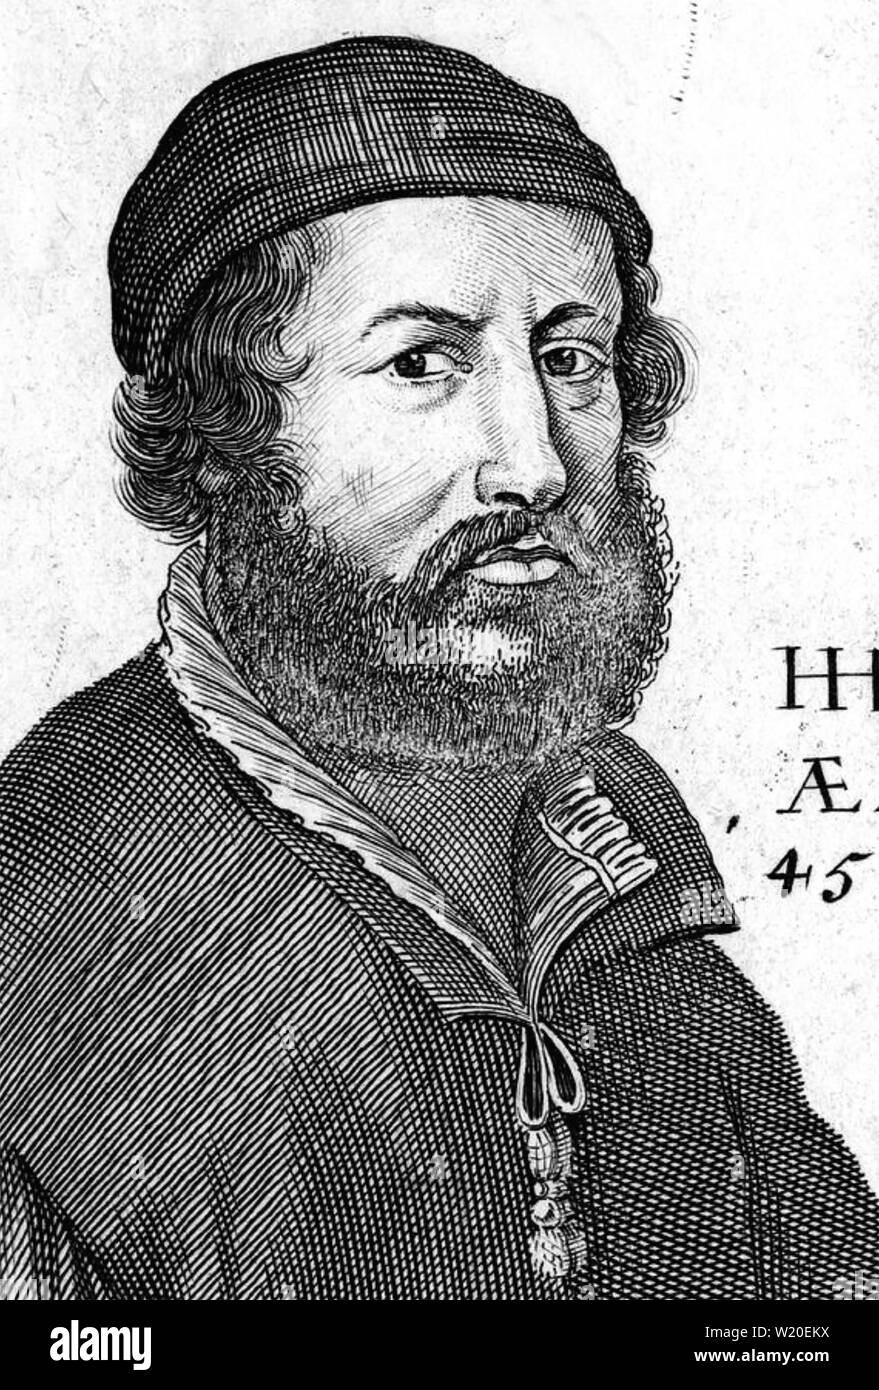 HANS HOLBEIN THE ELDER (c 1460-1524) German painter - Stock Image